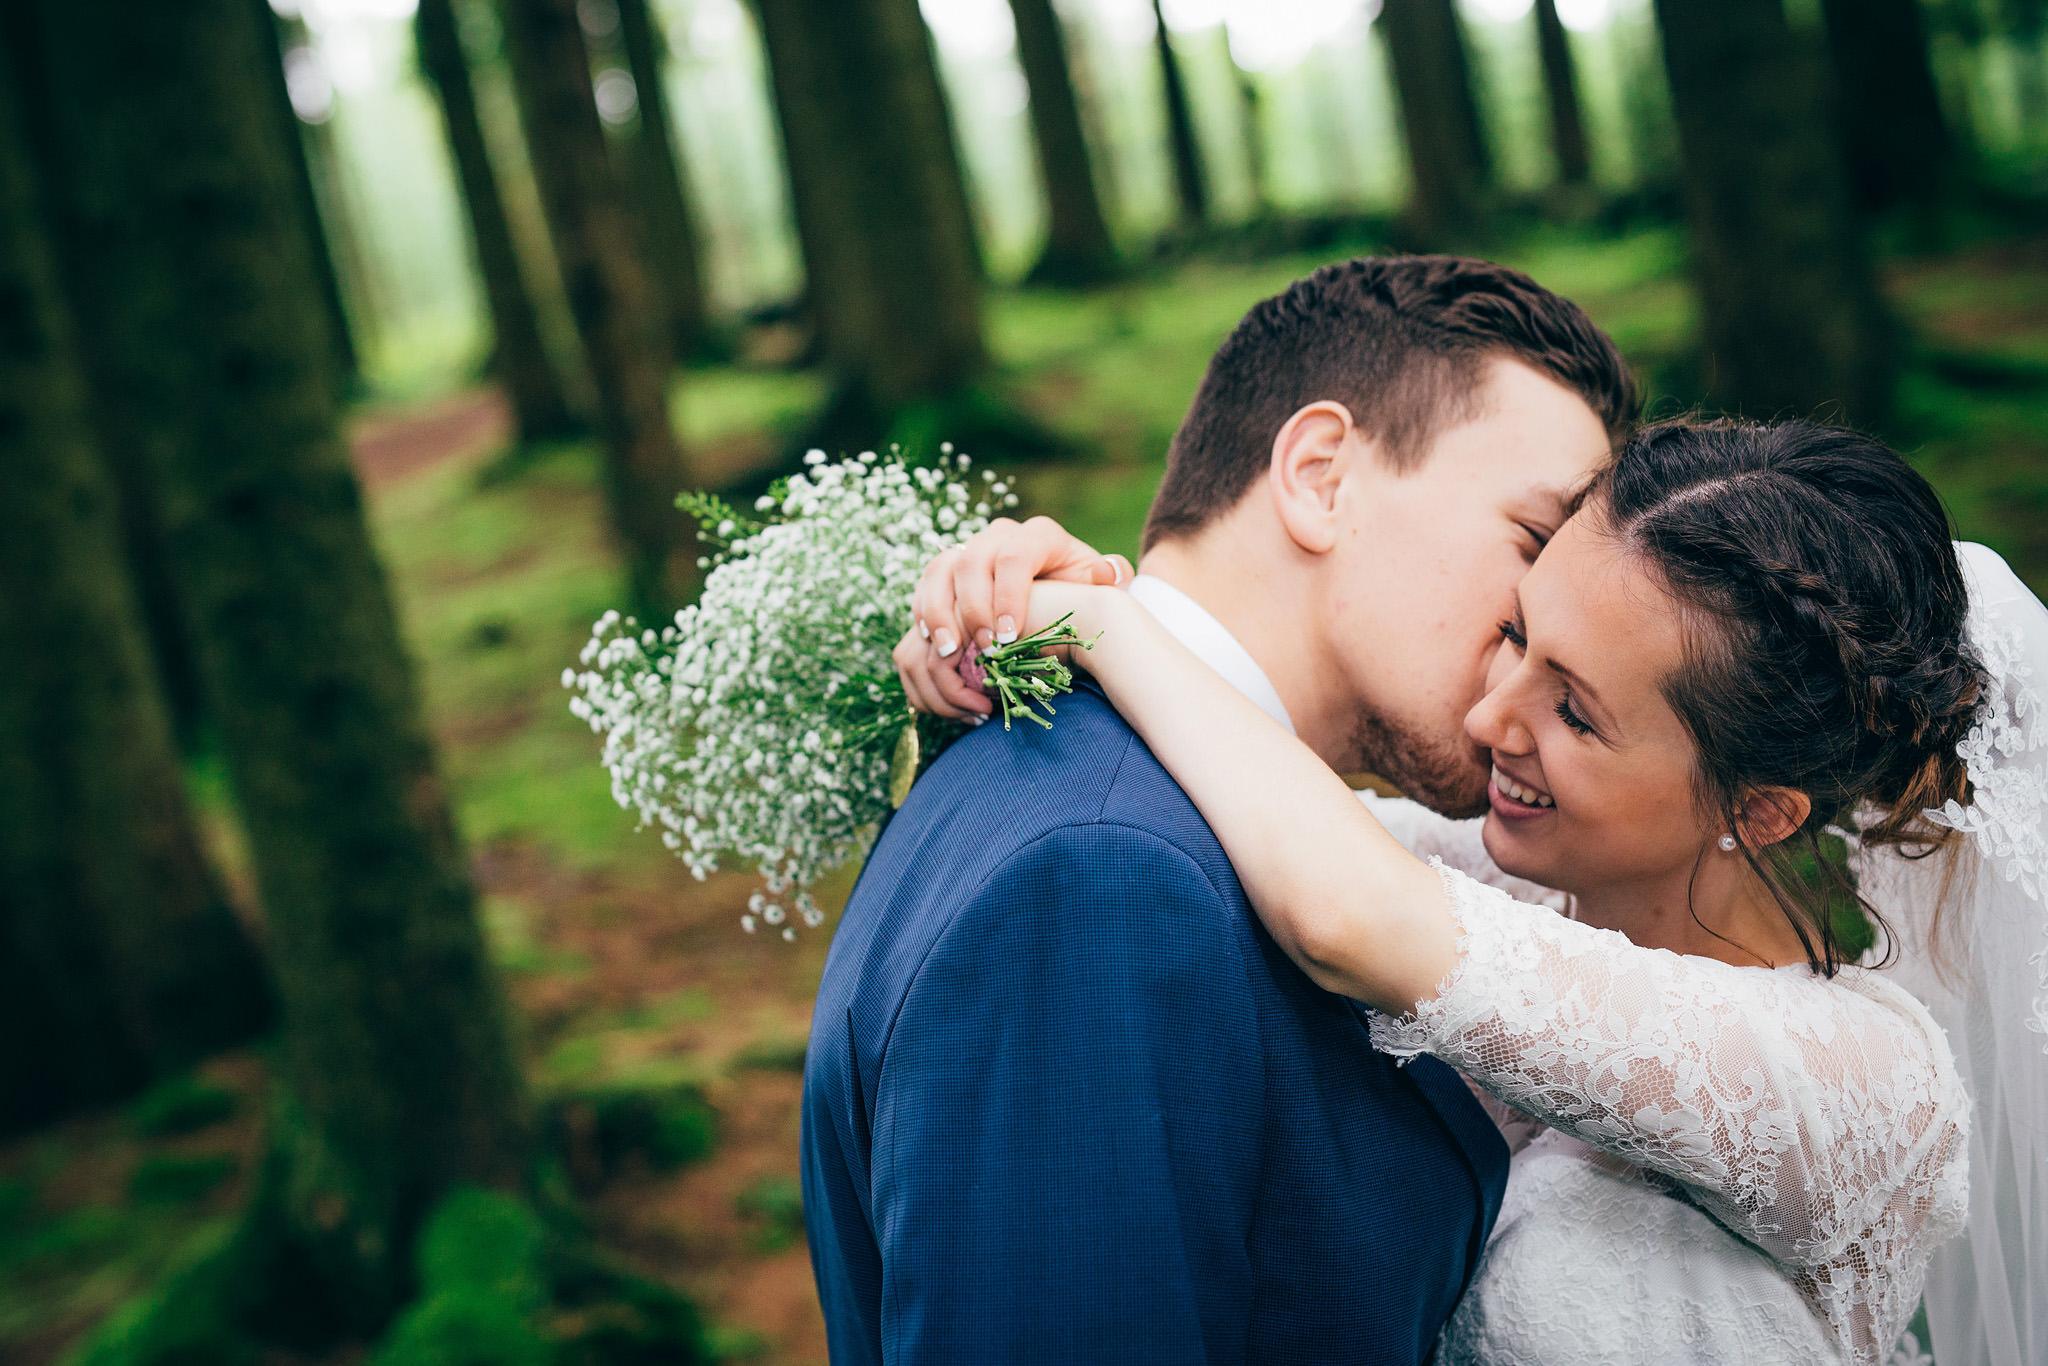 Norway+wedding+photographer+elopement+pre+wedding+Casey+Arneson-64.jpg